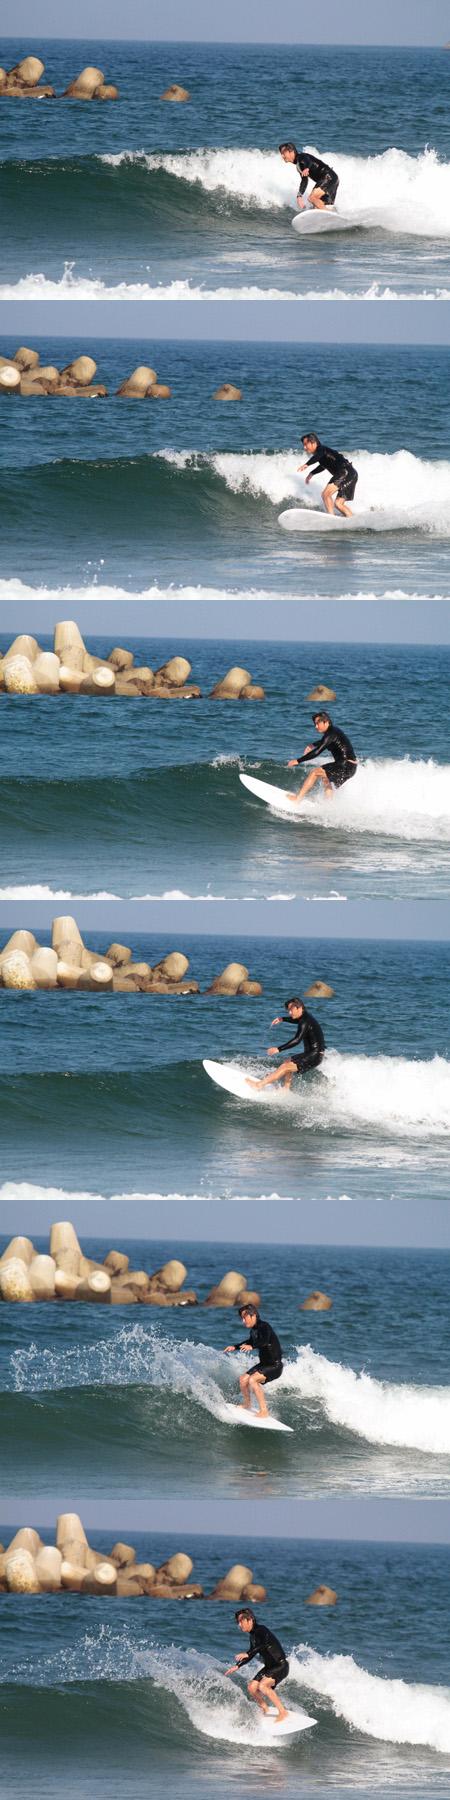 180728_EISHIN_SURF_NC5_3.jpg